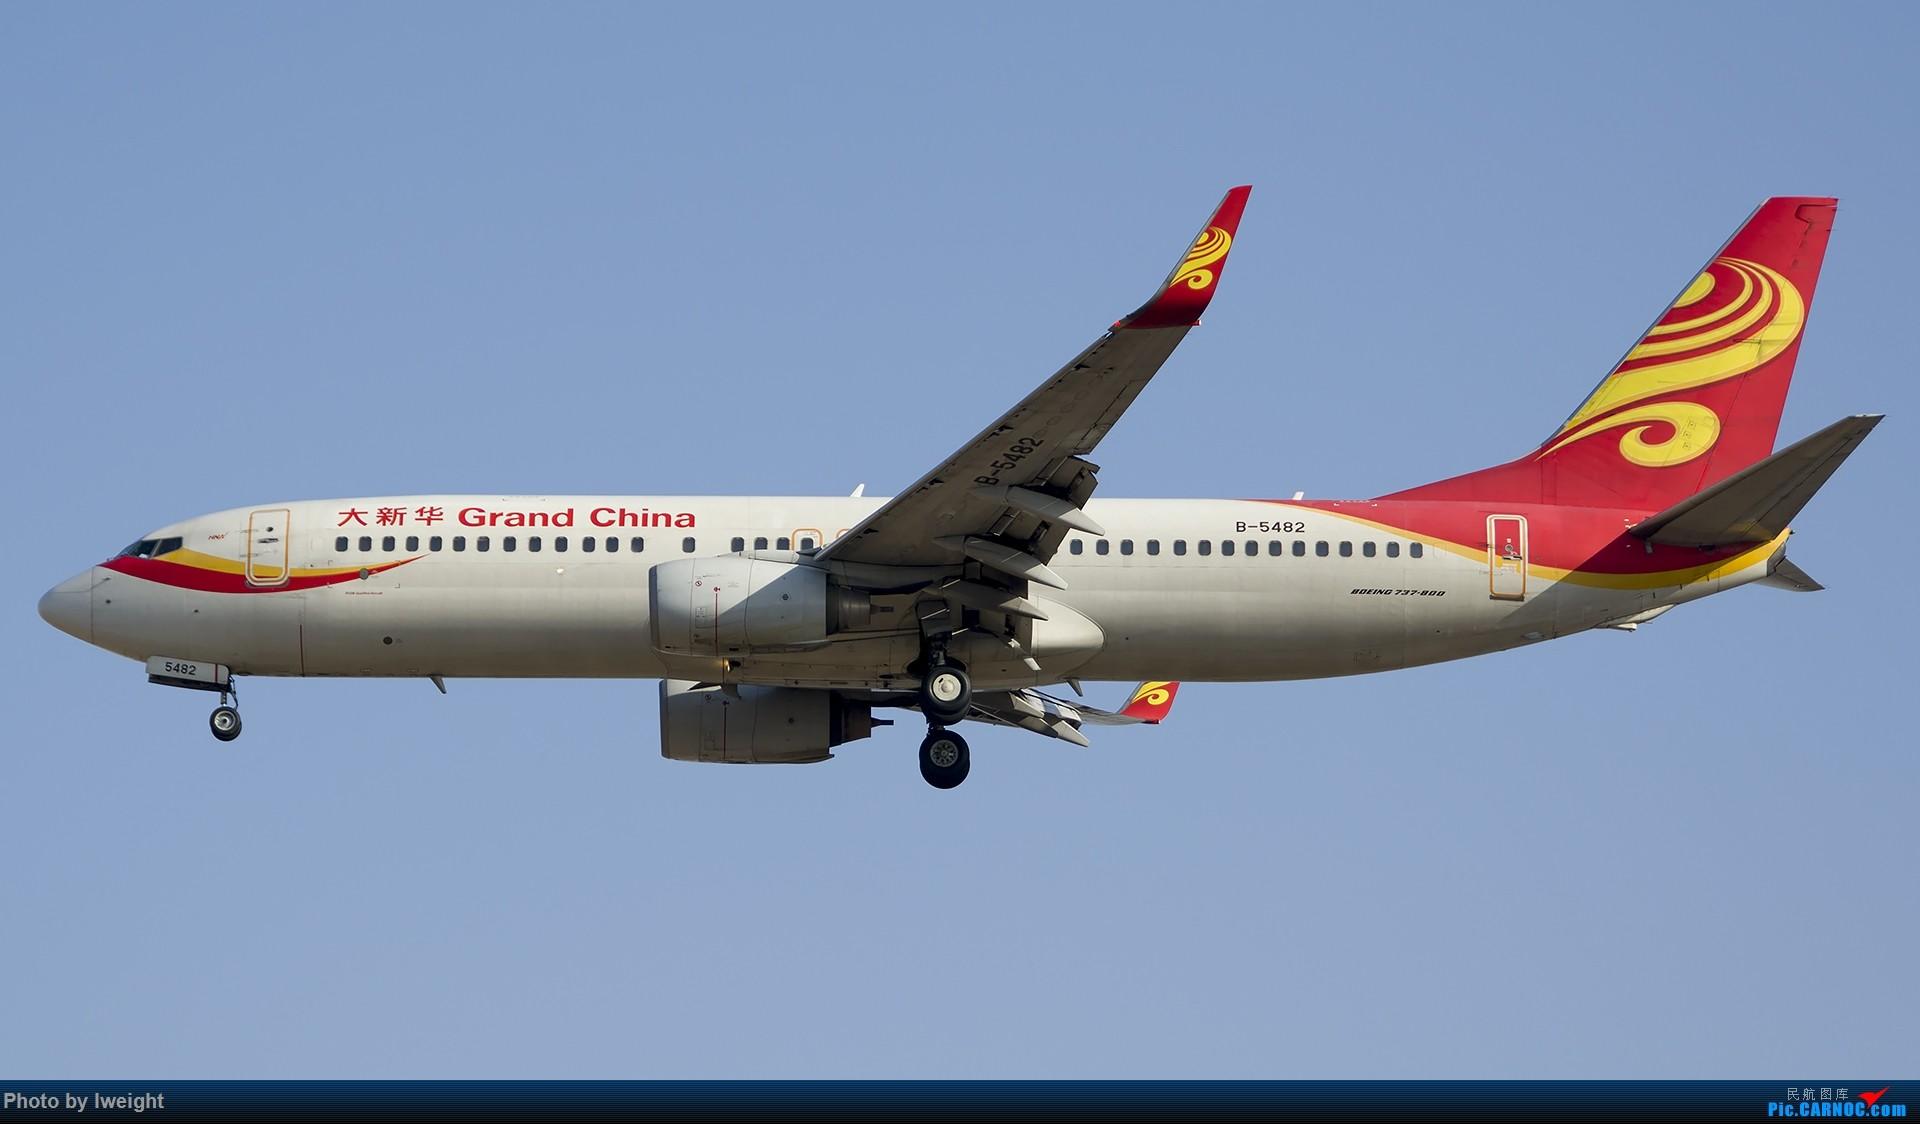 Re:[原创]庆祝升级777,发上今天在首都机场拍的所有飞机【2014-12-14】 BOEING 737-800 B-5482 中国北京首都国际机场